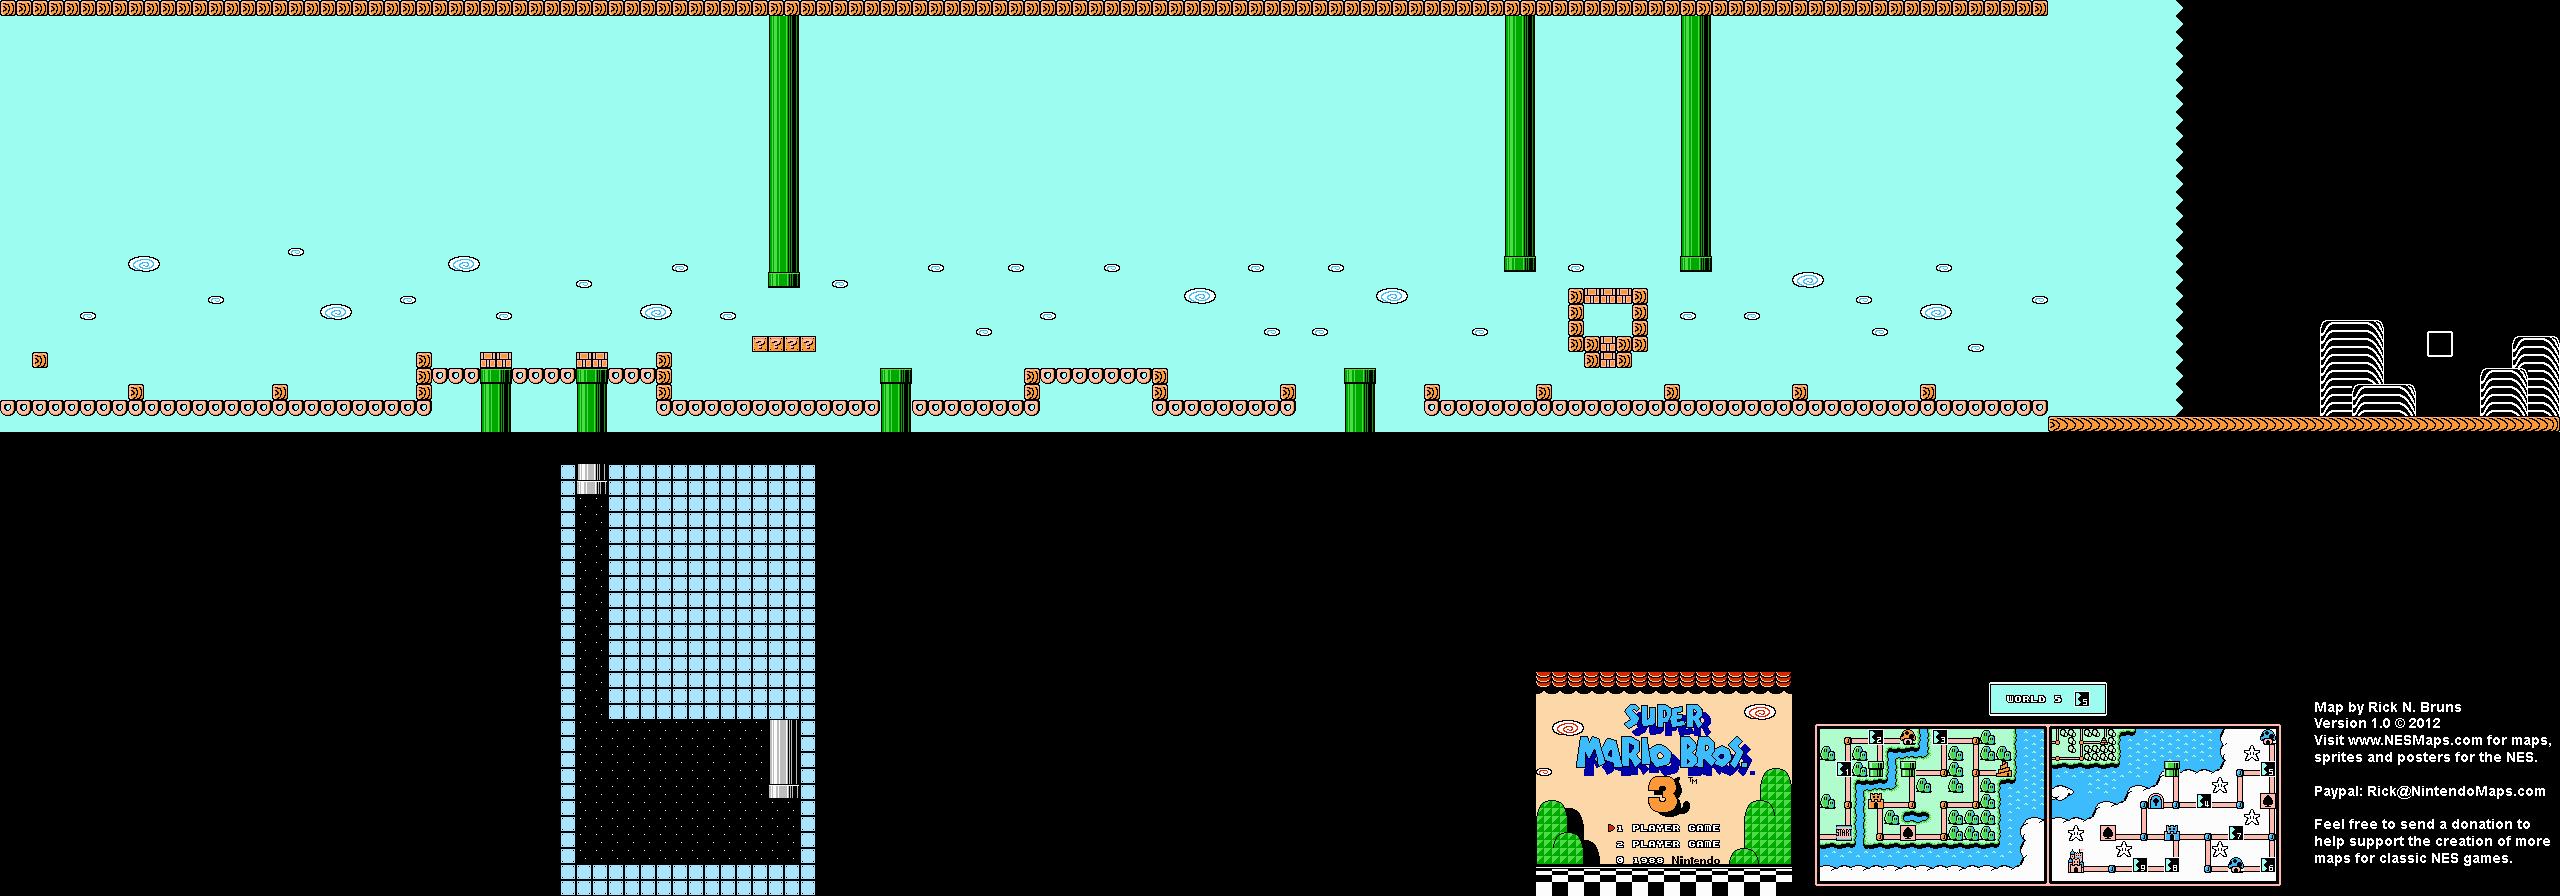 Super Mario Brothers 3 - World 5-5 Nintendo NES Map BG